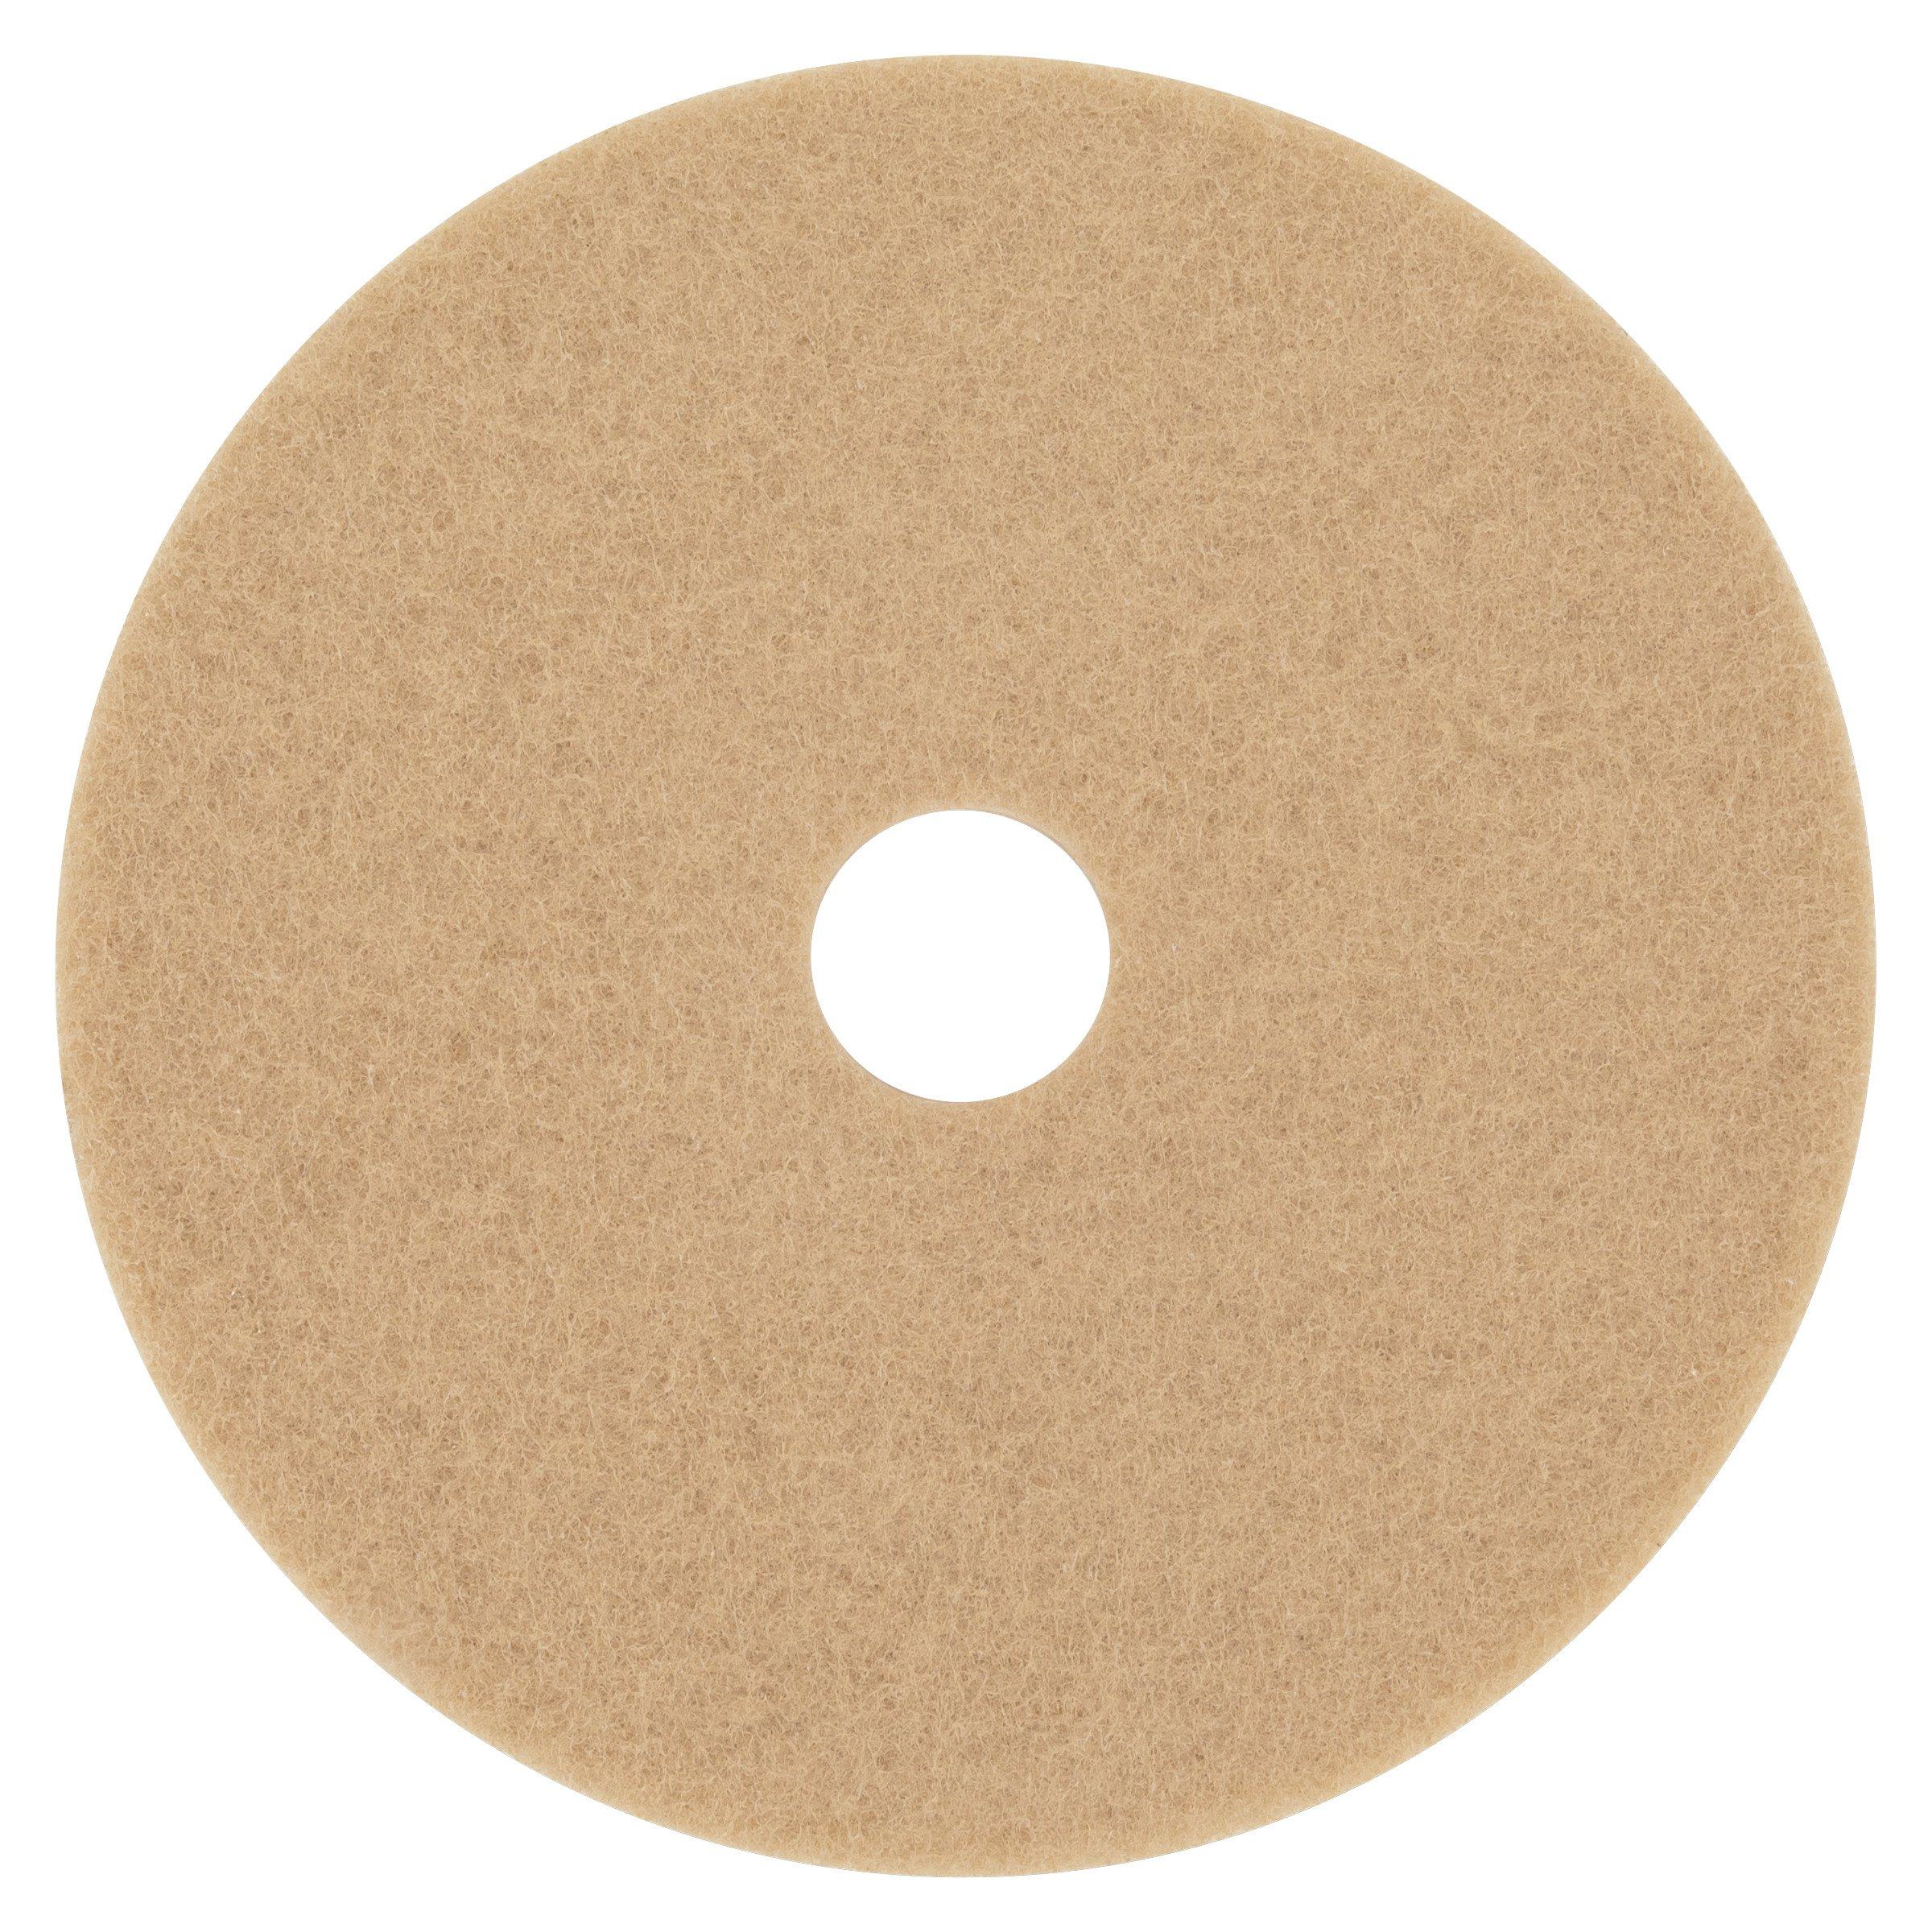 3M 05606 Ultra High-Speed Floor Burnishing Pads 3400, 20'' Diameter, Tan (Case of 5)